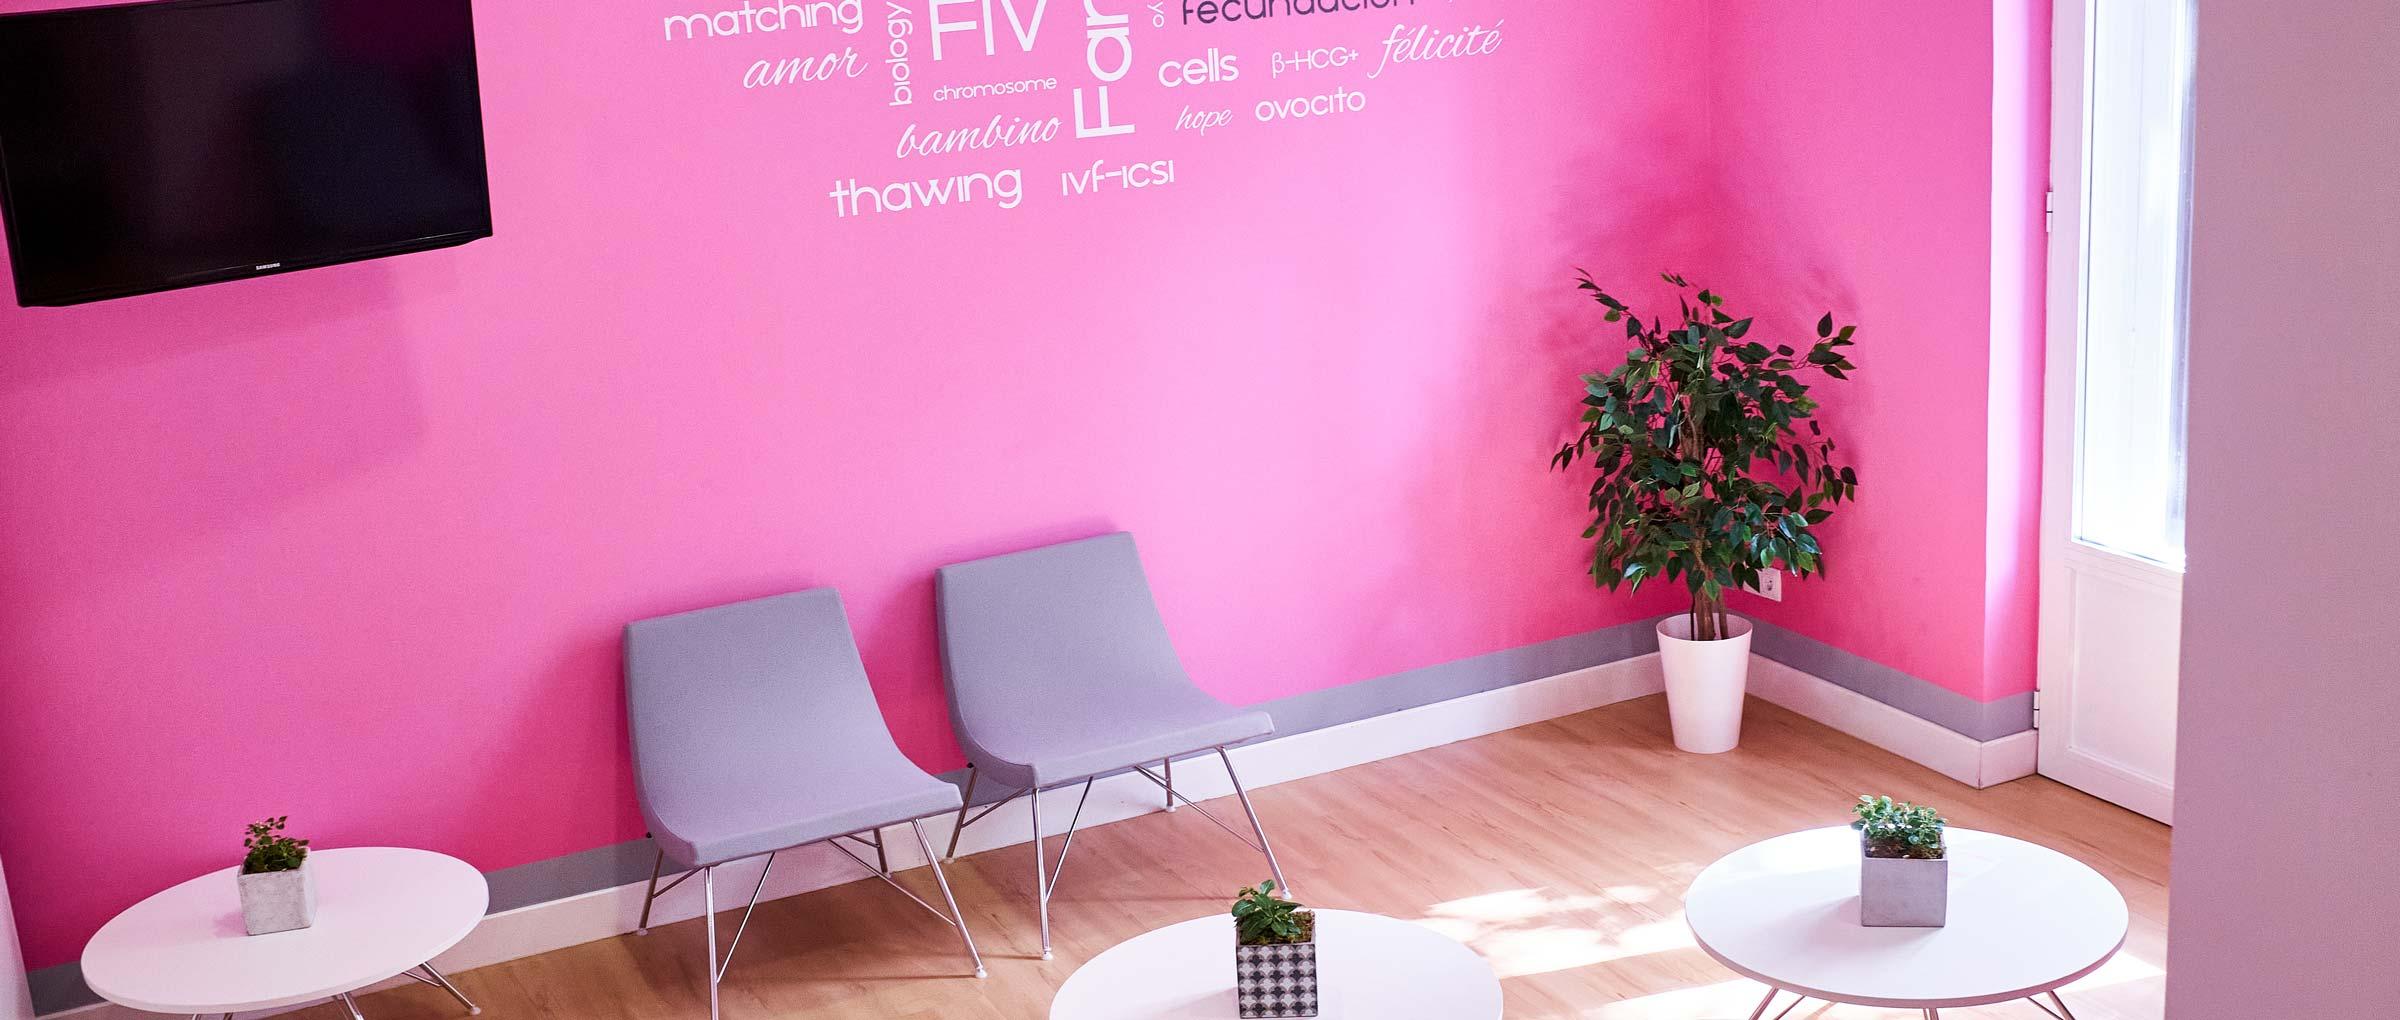 Love Fertility Waiting room